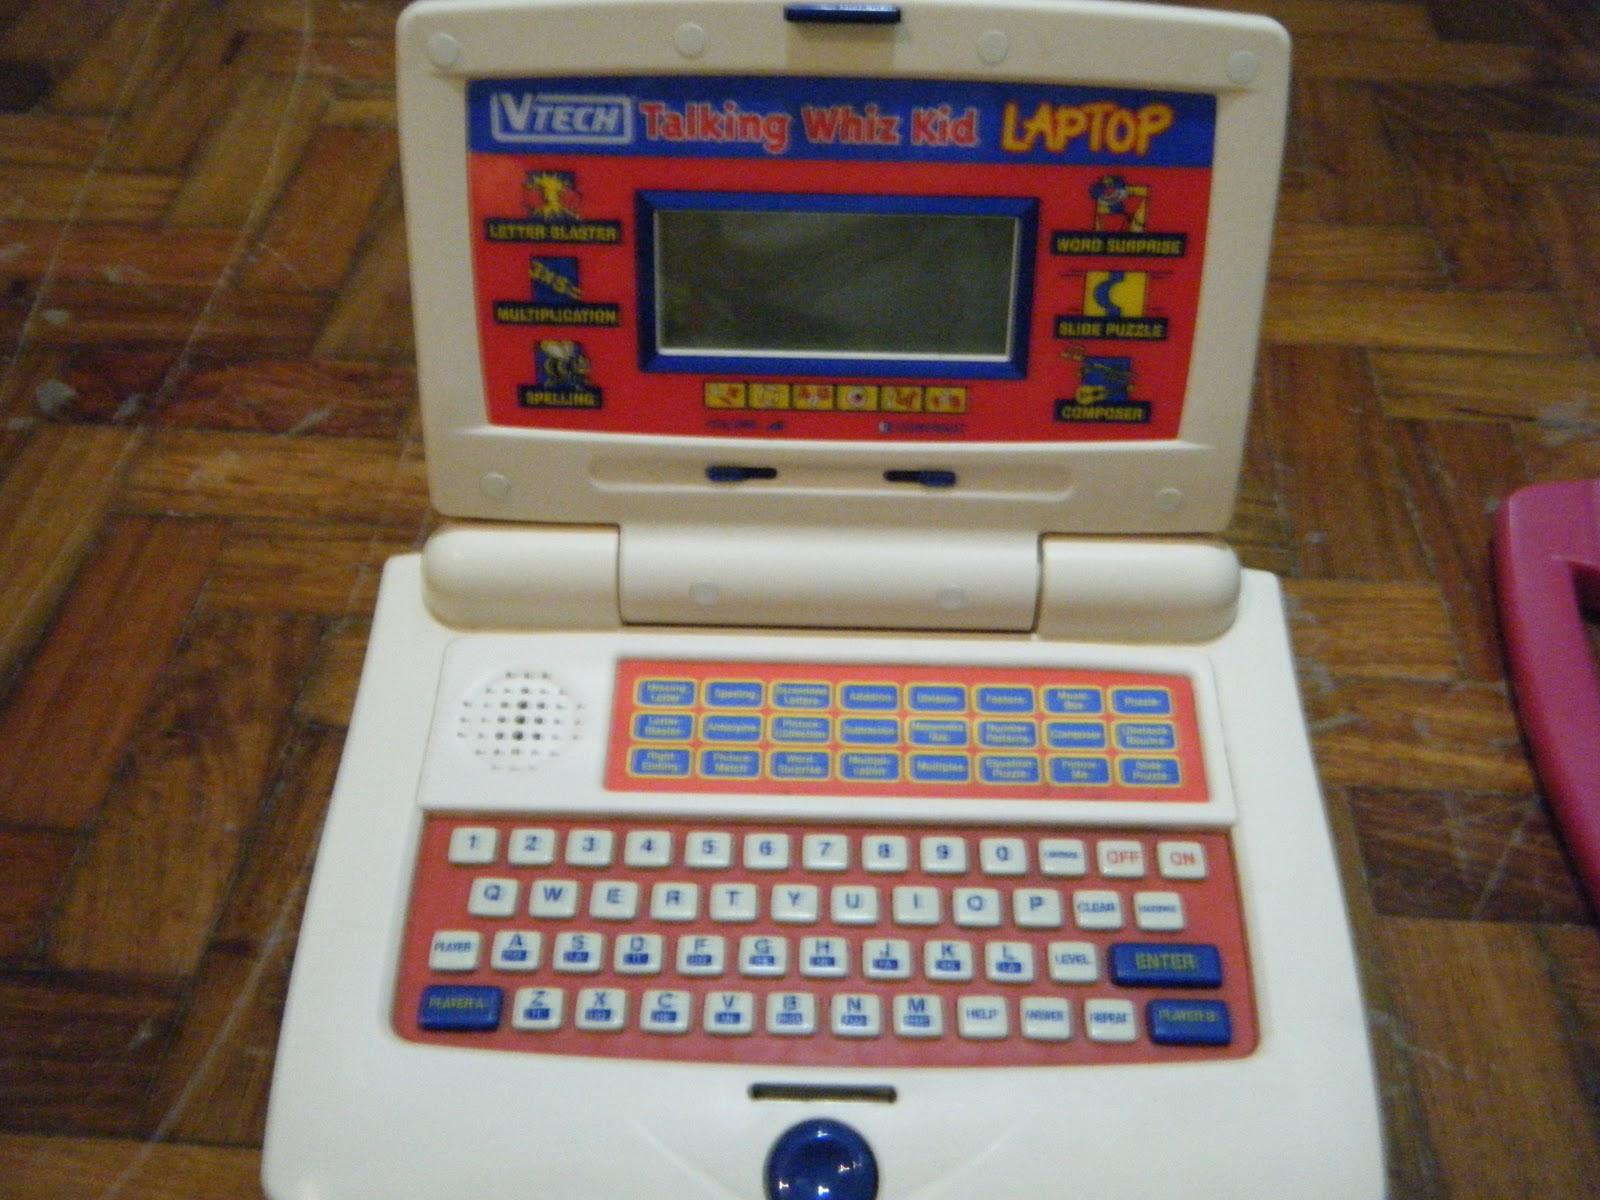 Betere Baby Lucky Baby: VTECH TALKING WHIZ KID LAPTOP 999P RF-79